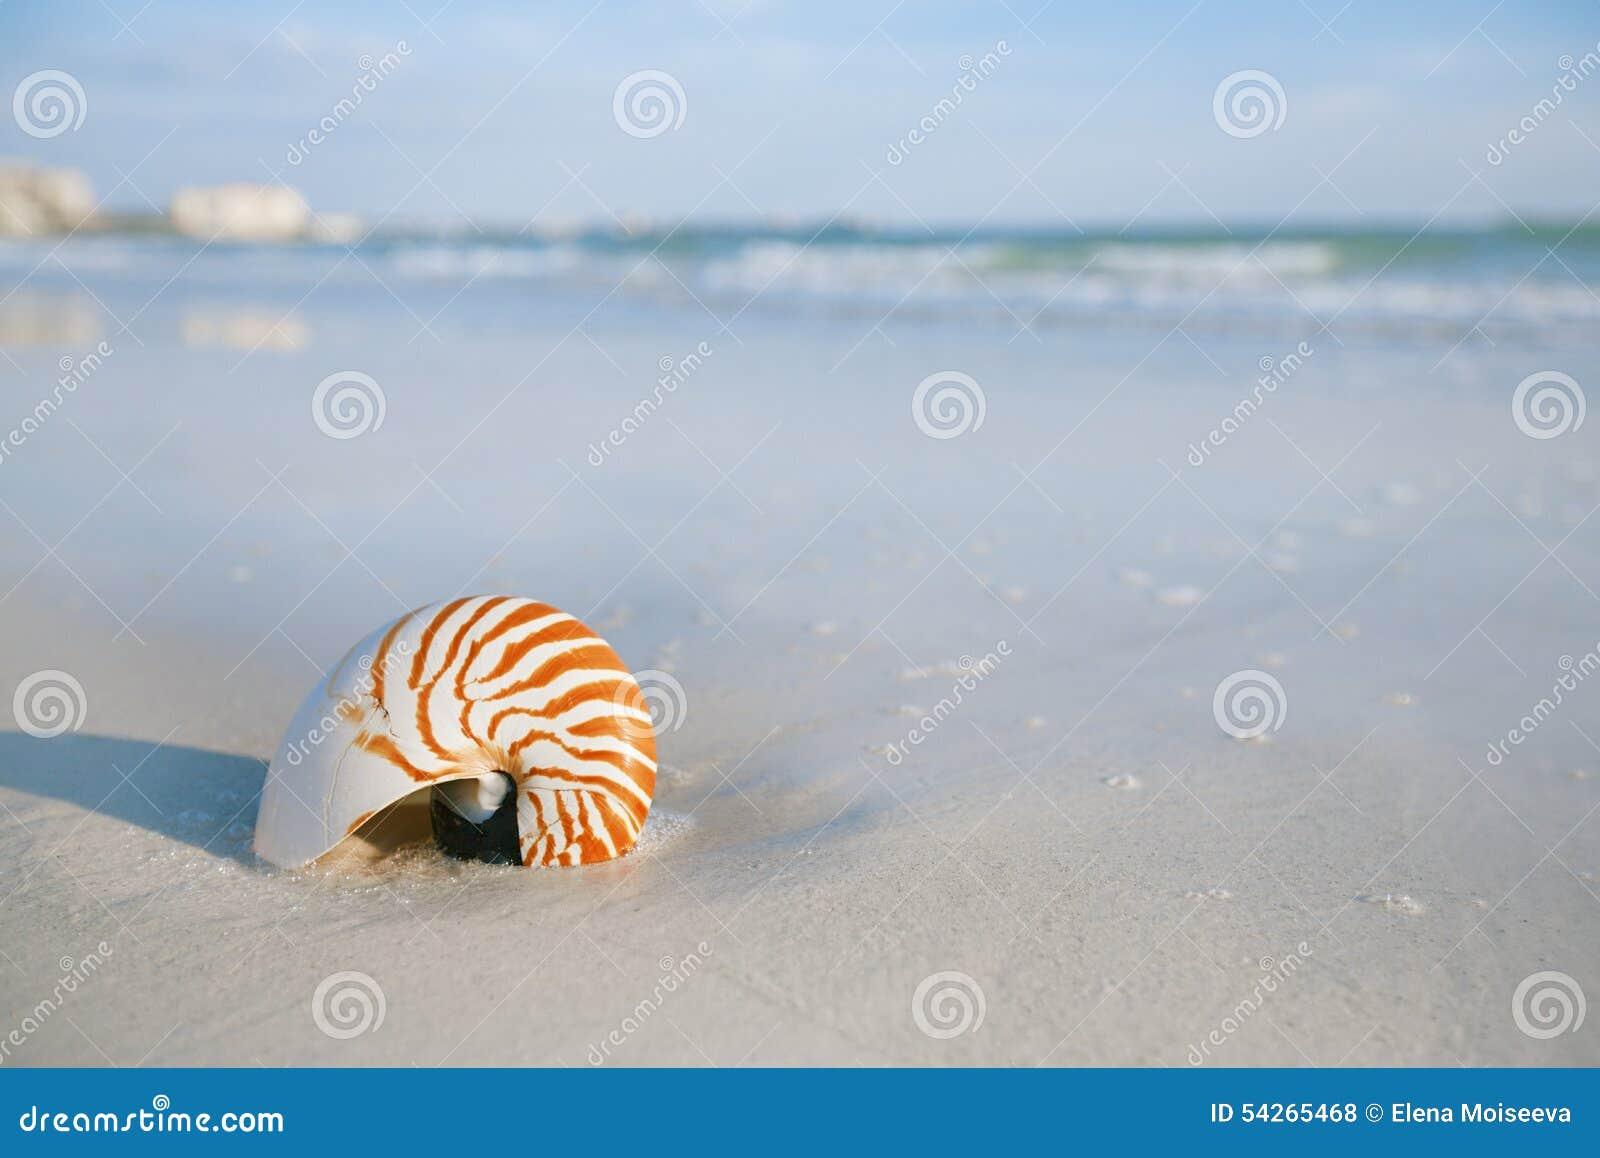 Nice Sea Shells On The Sandy Beach Stock Image ...